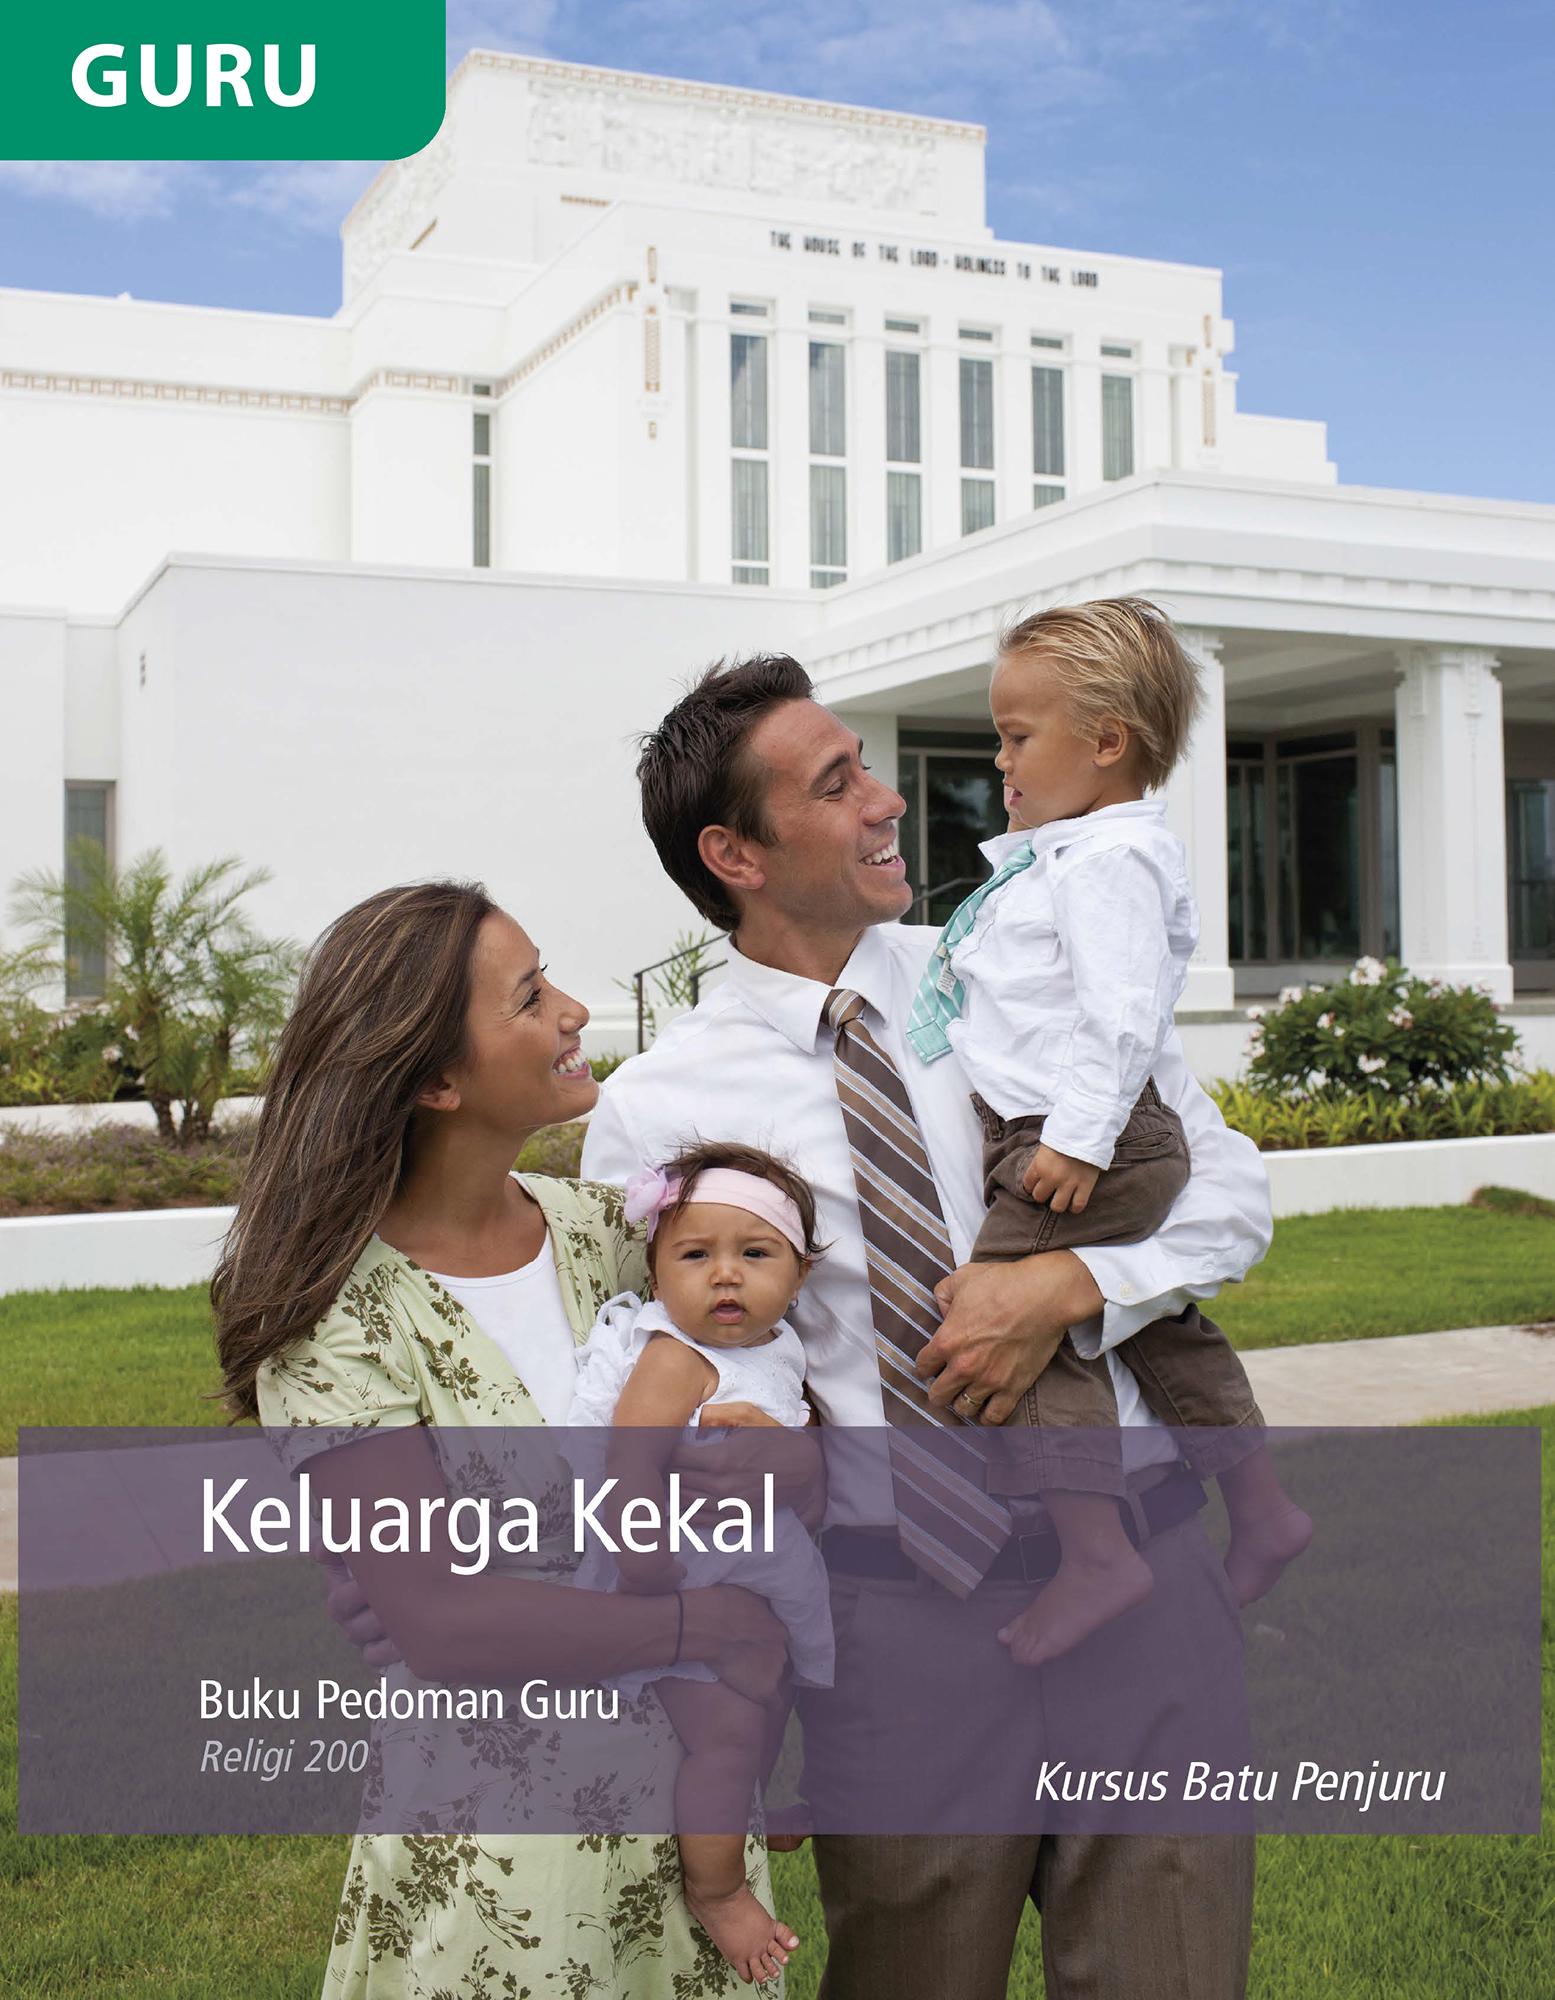 Buku Pedoman Guru Keluarga Kekal (Religi 200)